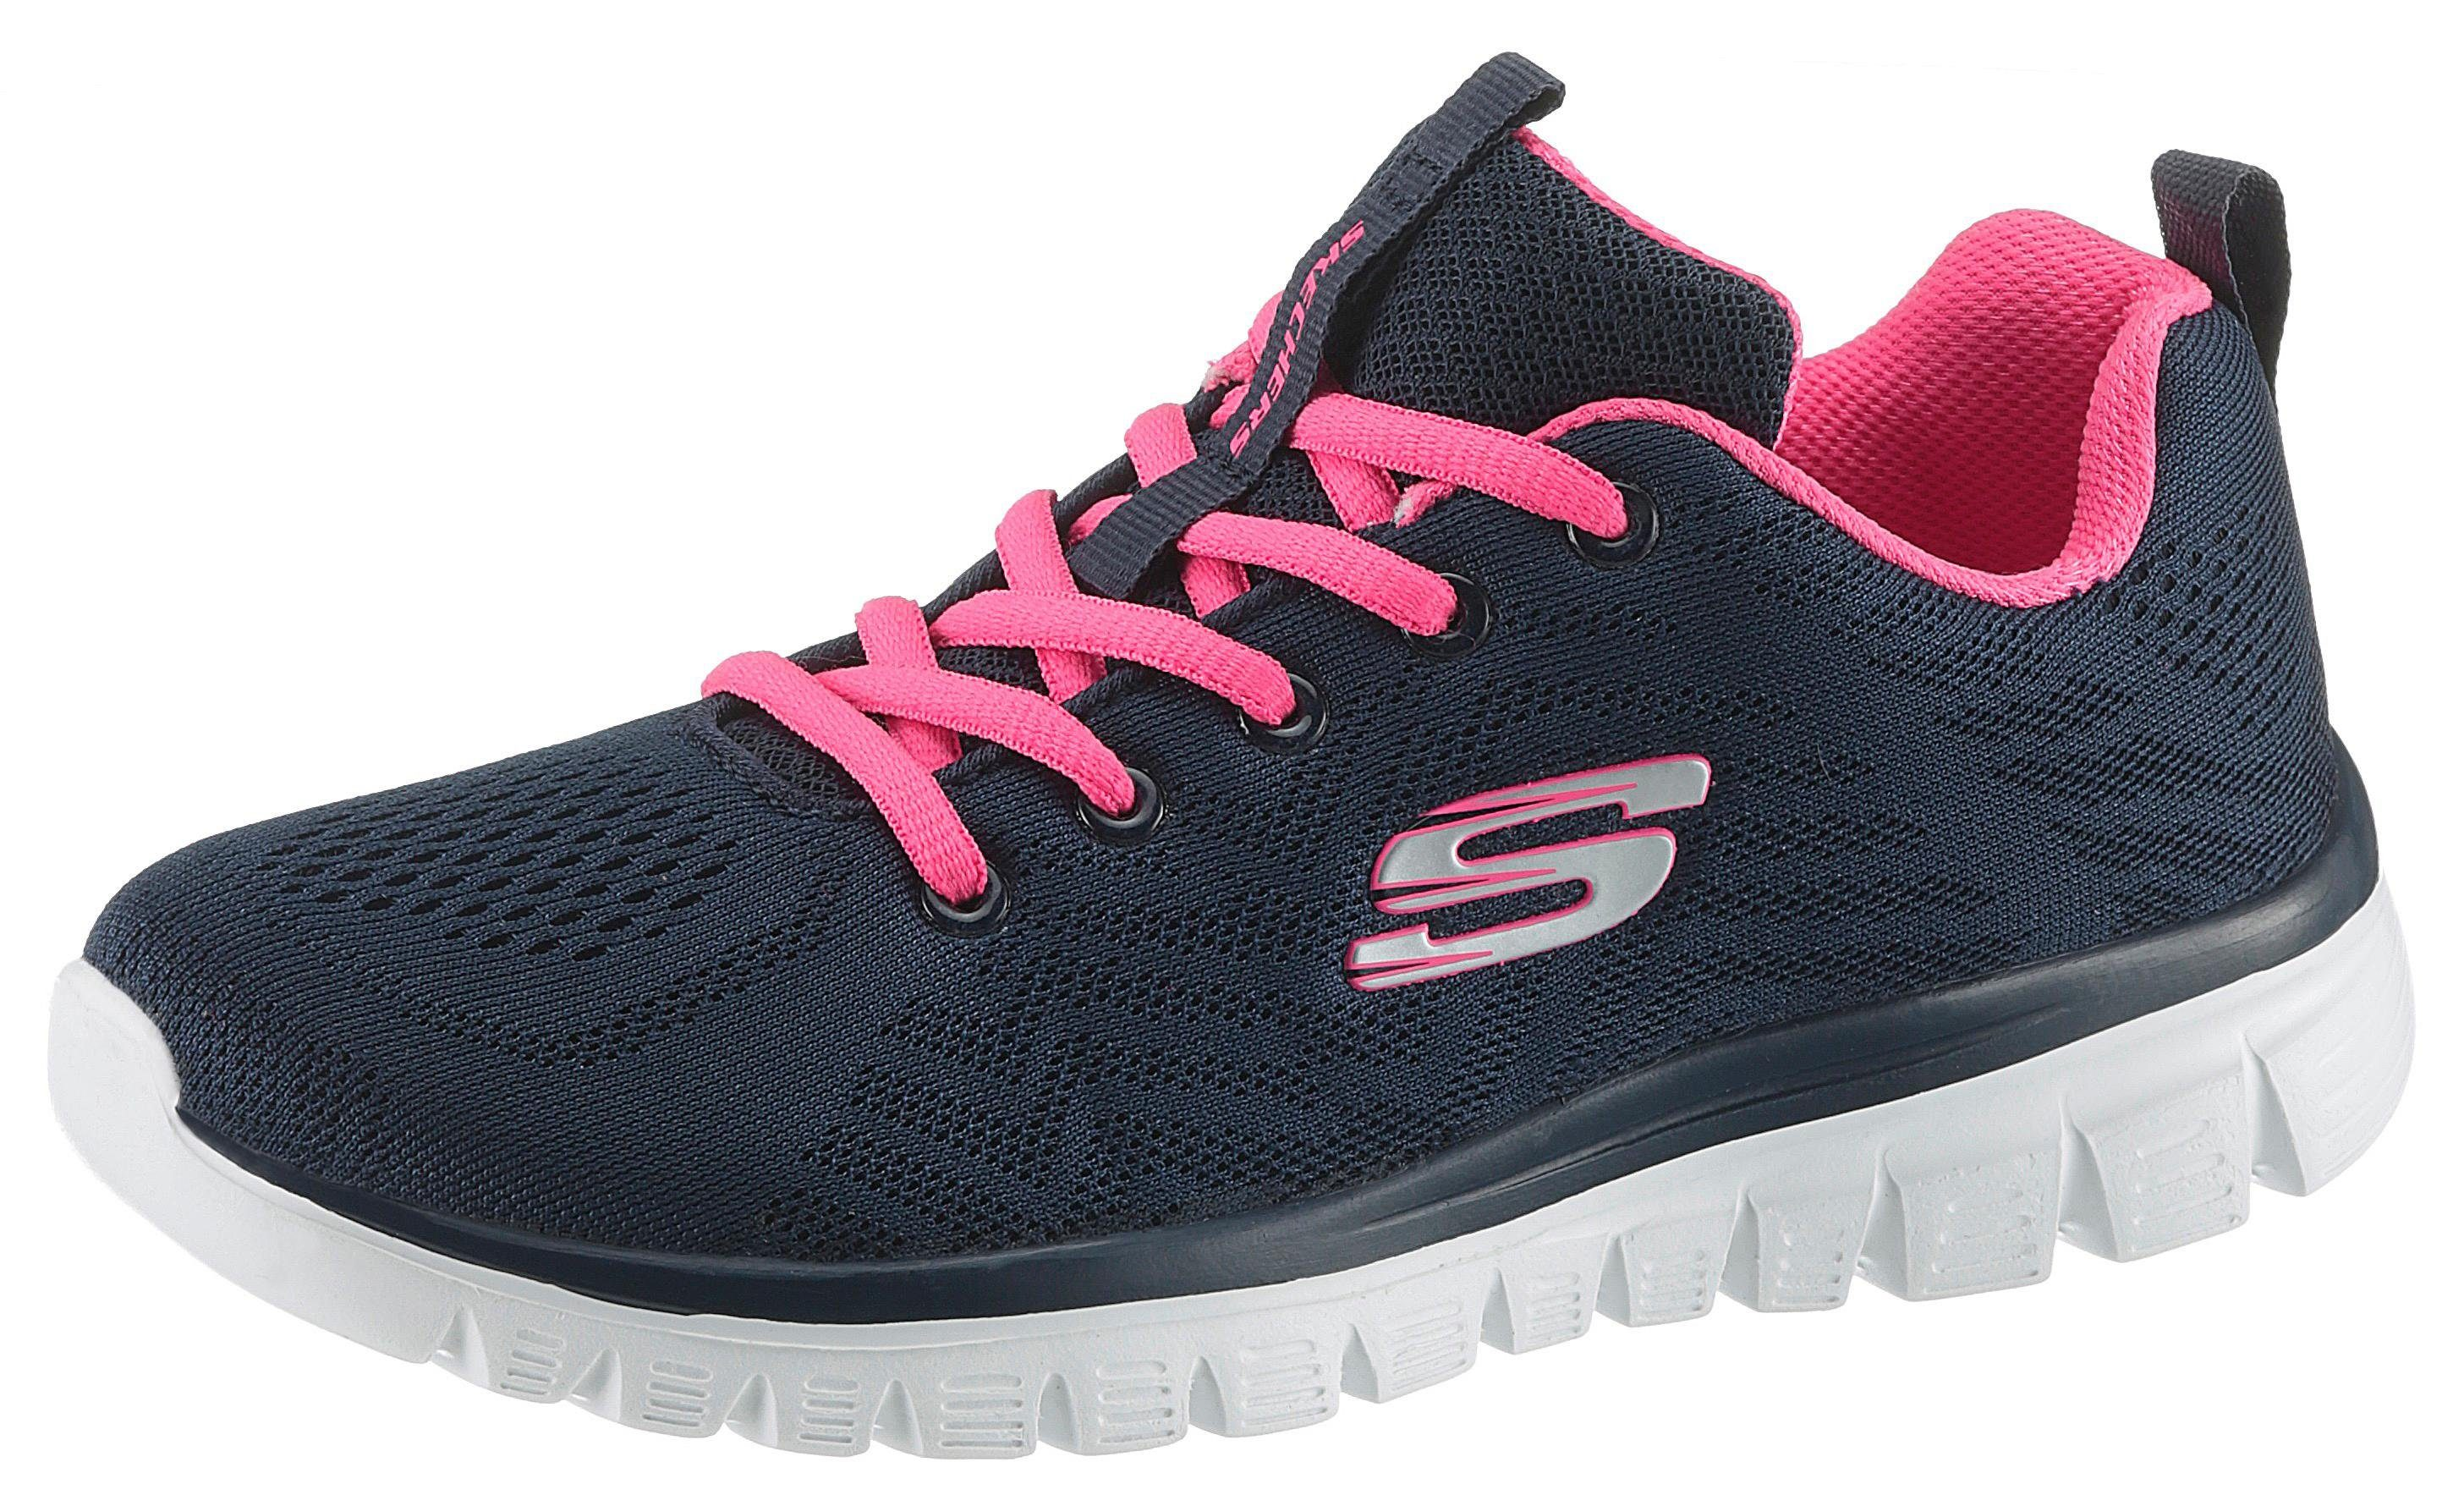 Skechers »Graceful Get Connected« Sneaker mit Dämpfung qdBPl